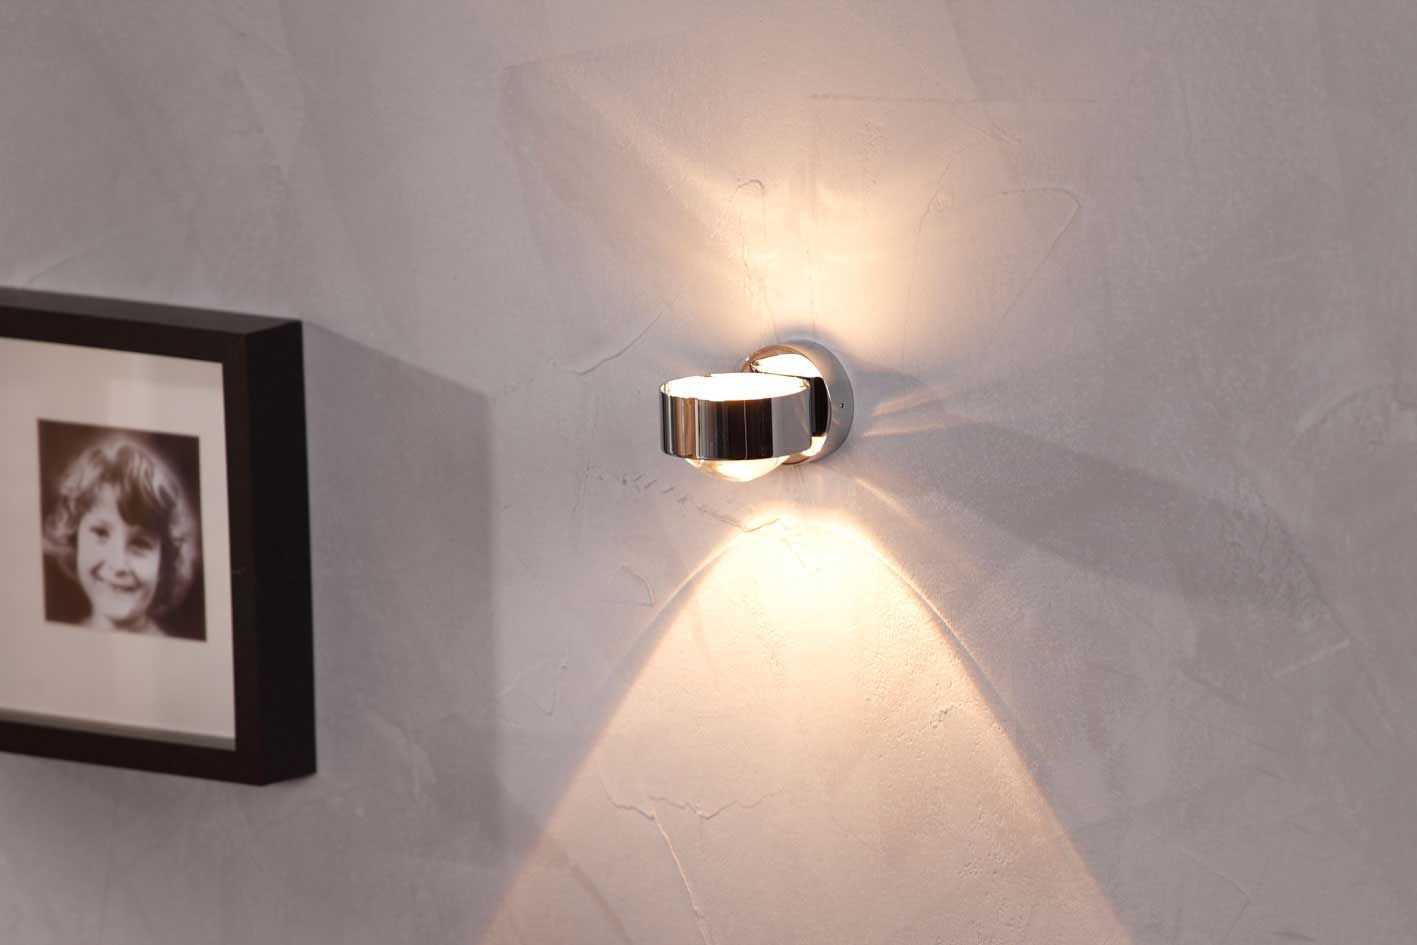 Puk Wall Design Led Wandleuchte Von Top Light Wandleuchte Indirekte Beleuchtung Decke Beleuchtungsideen